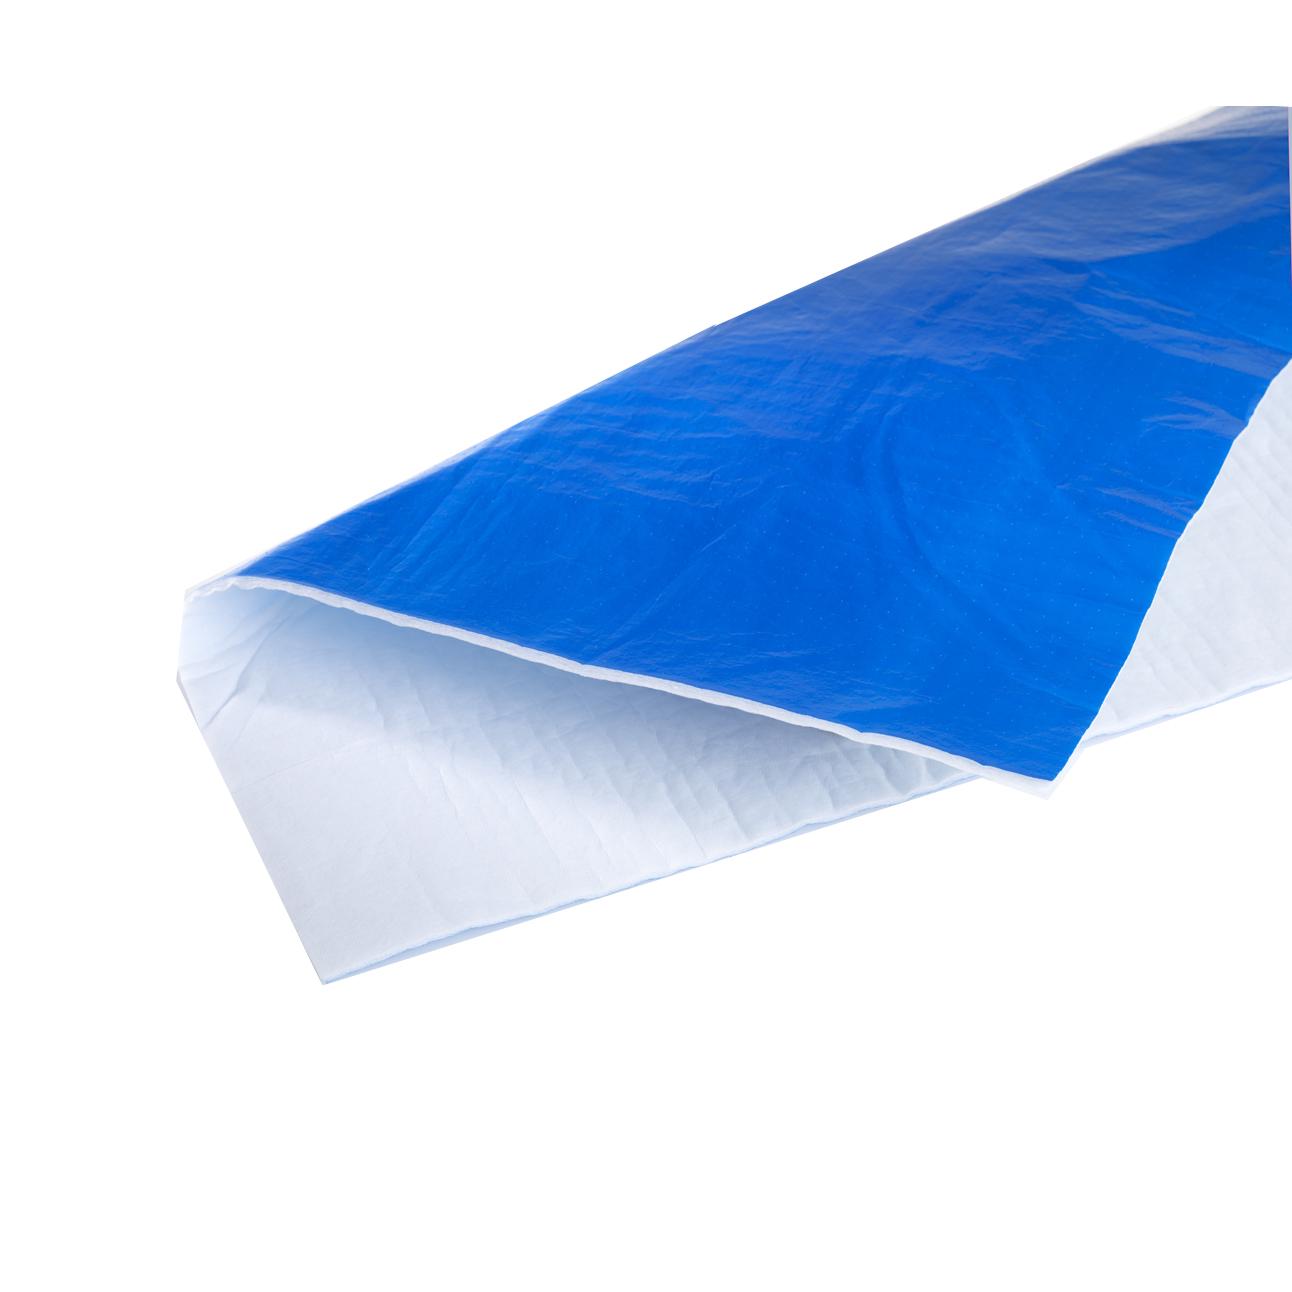 OR Soaker Sheets Image